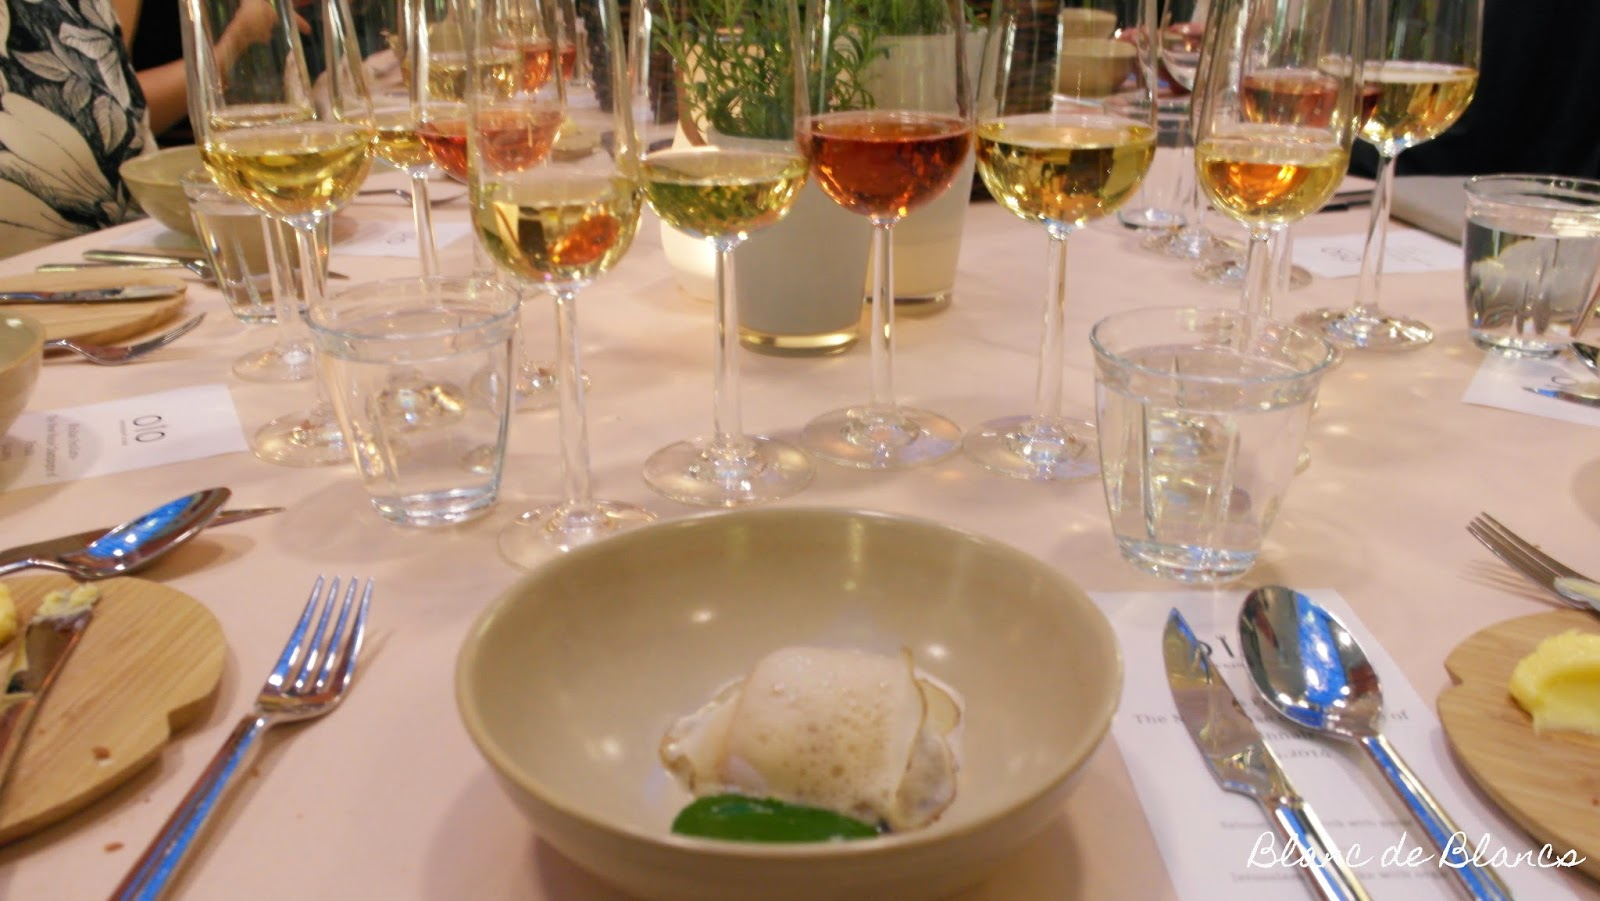 Ravintola Olo, Finnairin Business Class menu ja Nicolas Feuillatten samppanjat - www.blancdeblancs.fi